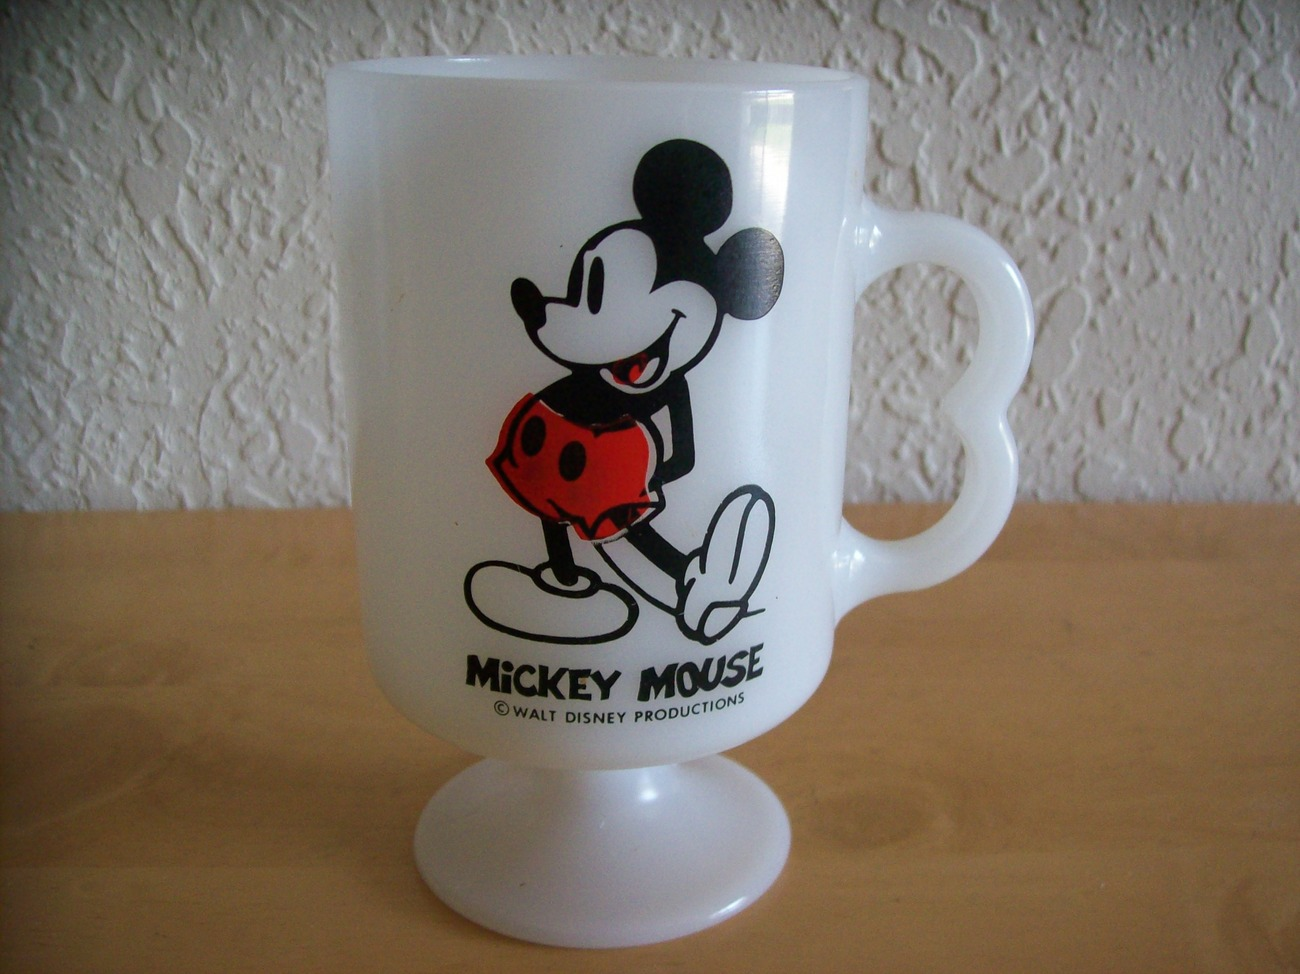 Disney Mickey Mouse Milk Pedestal Glass Cup